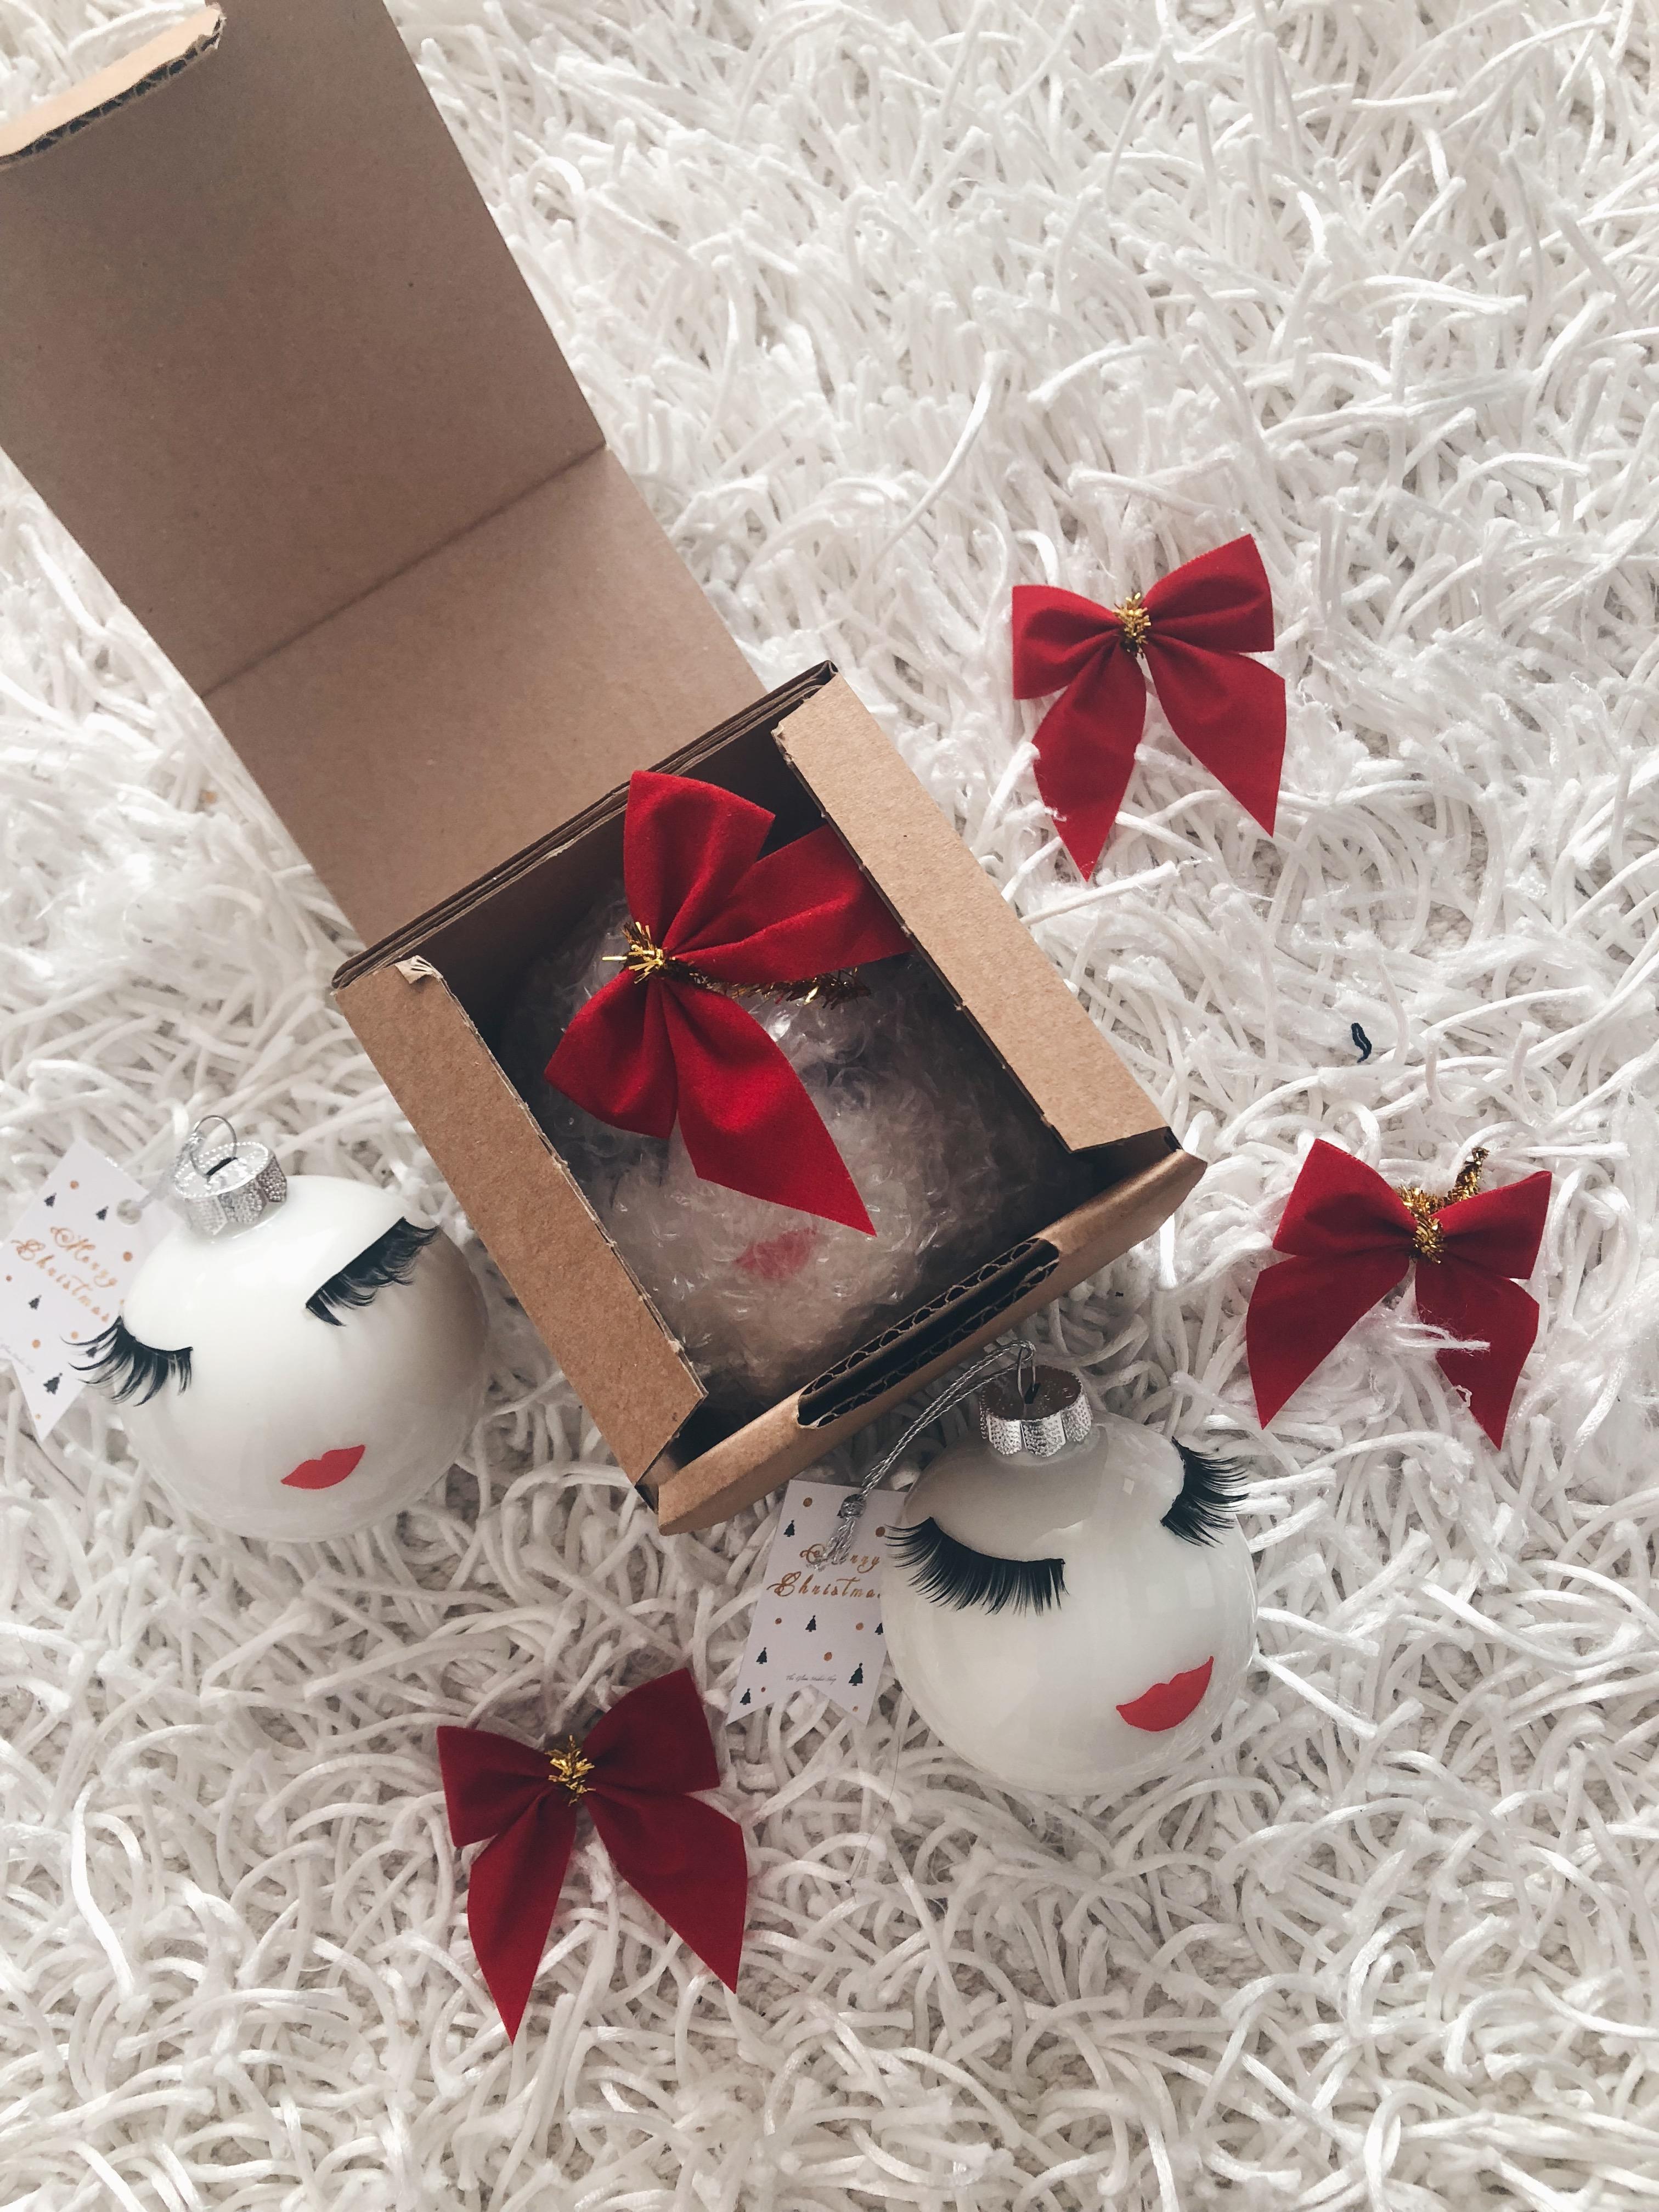 Lashes Christmas Ornament